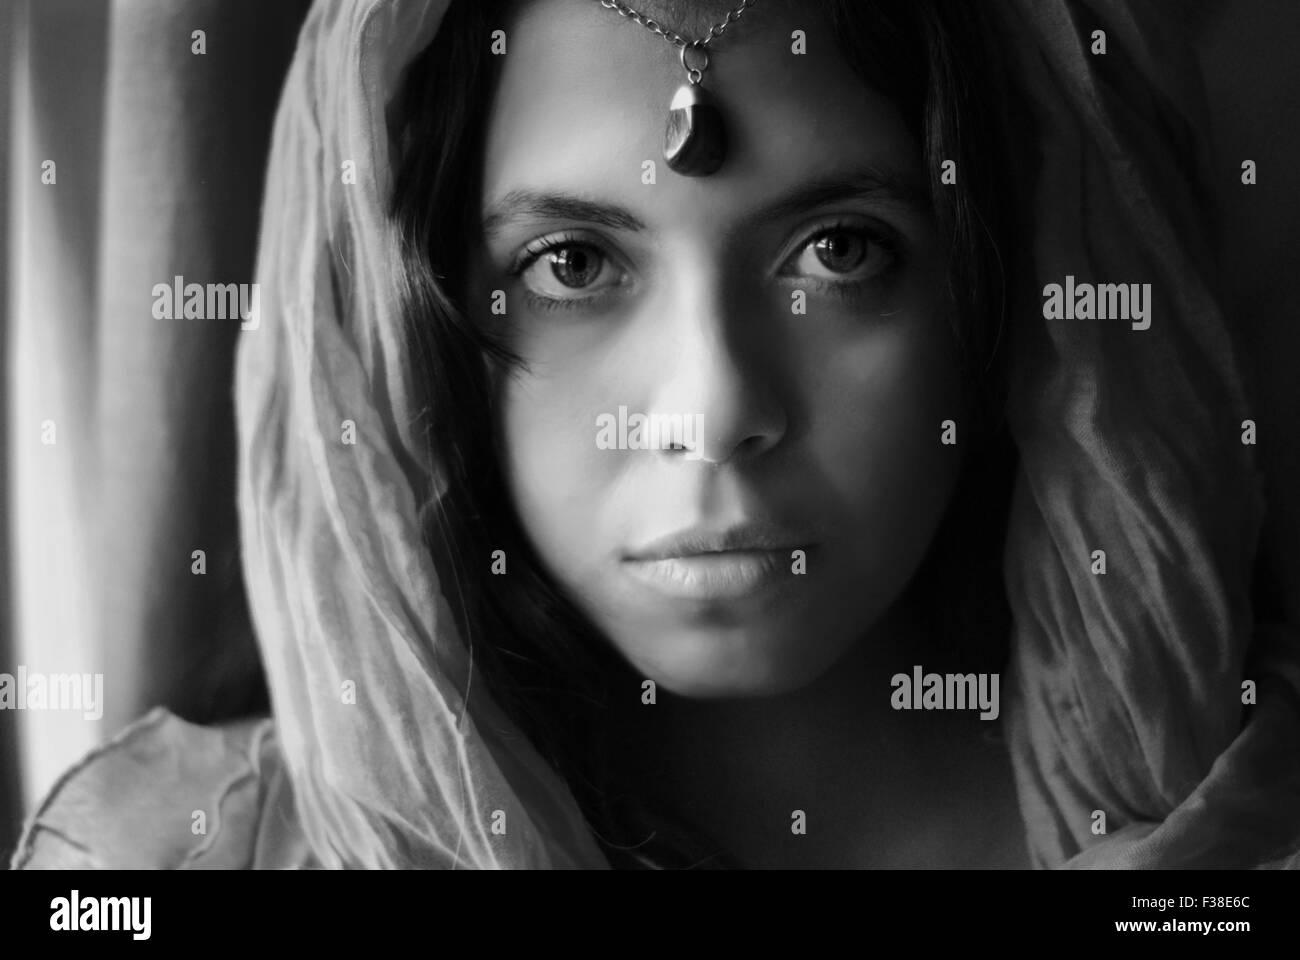 pure soul in black and white girl Arabian look like strange beauty - Stock Image